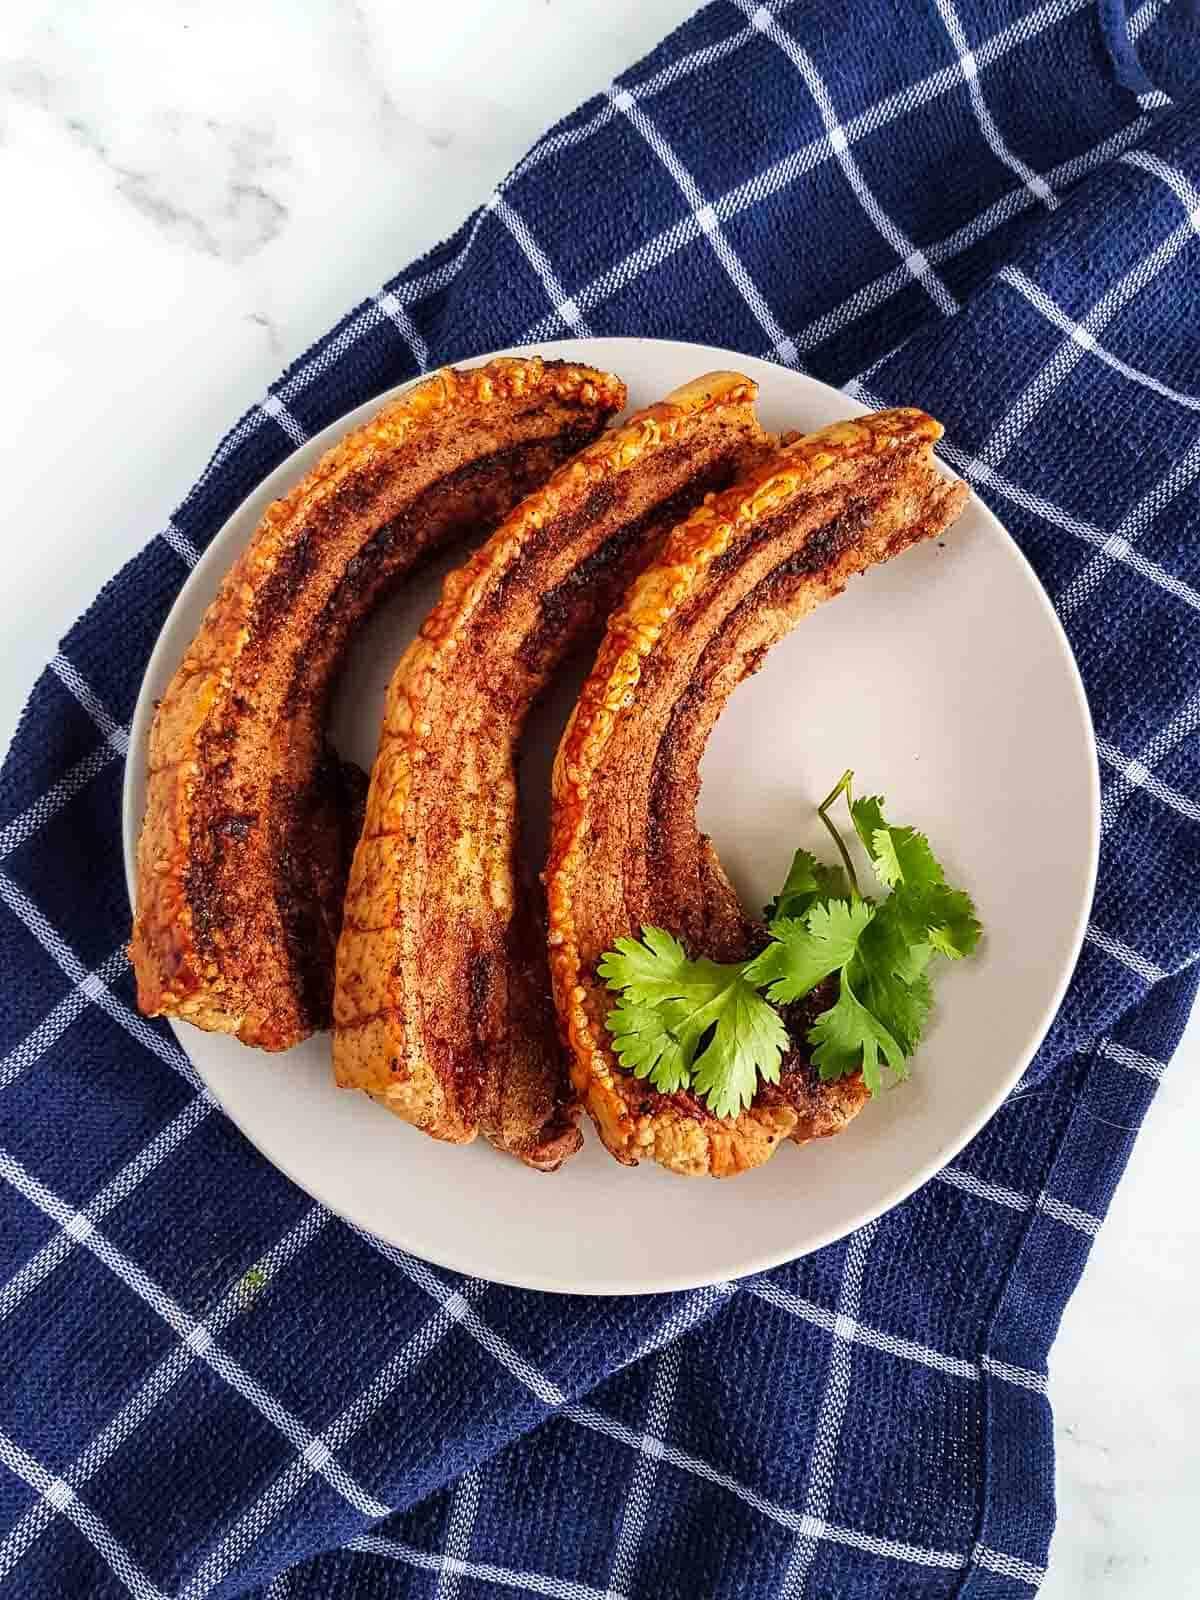 Crispy sliced pork belly with crackling on a plate.